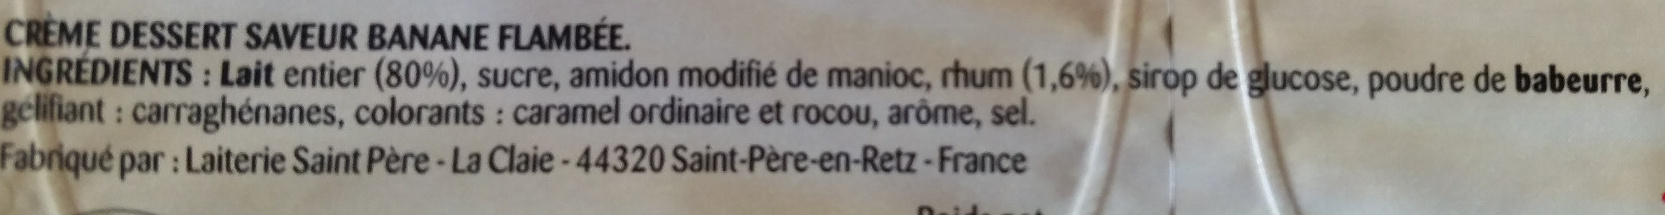 Crème dessert saveur Banane Flambée Paturages - Ingrediënten - fr